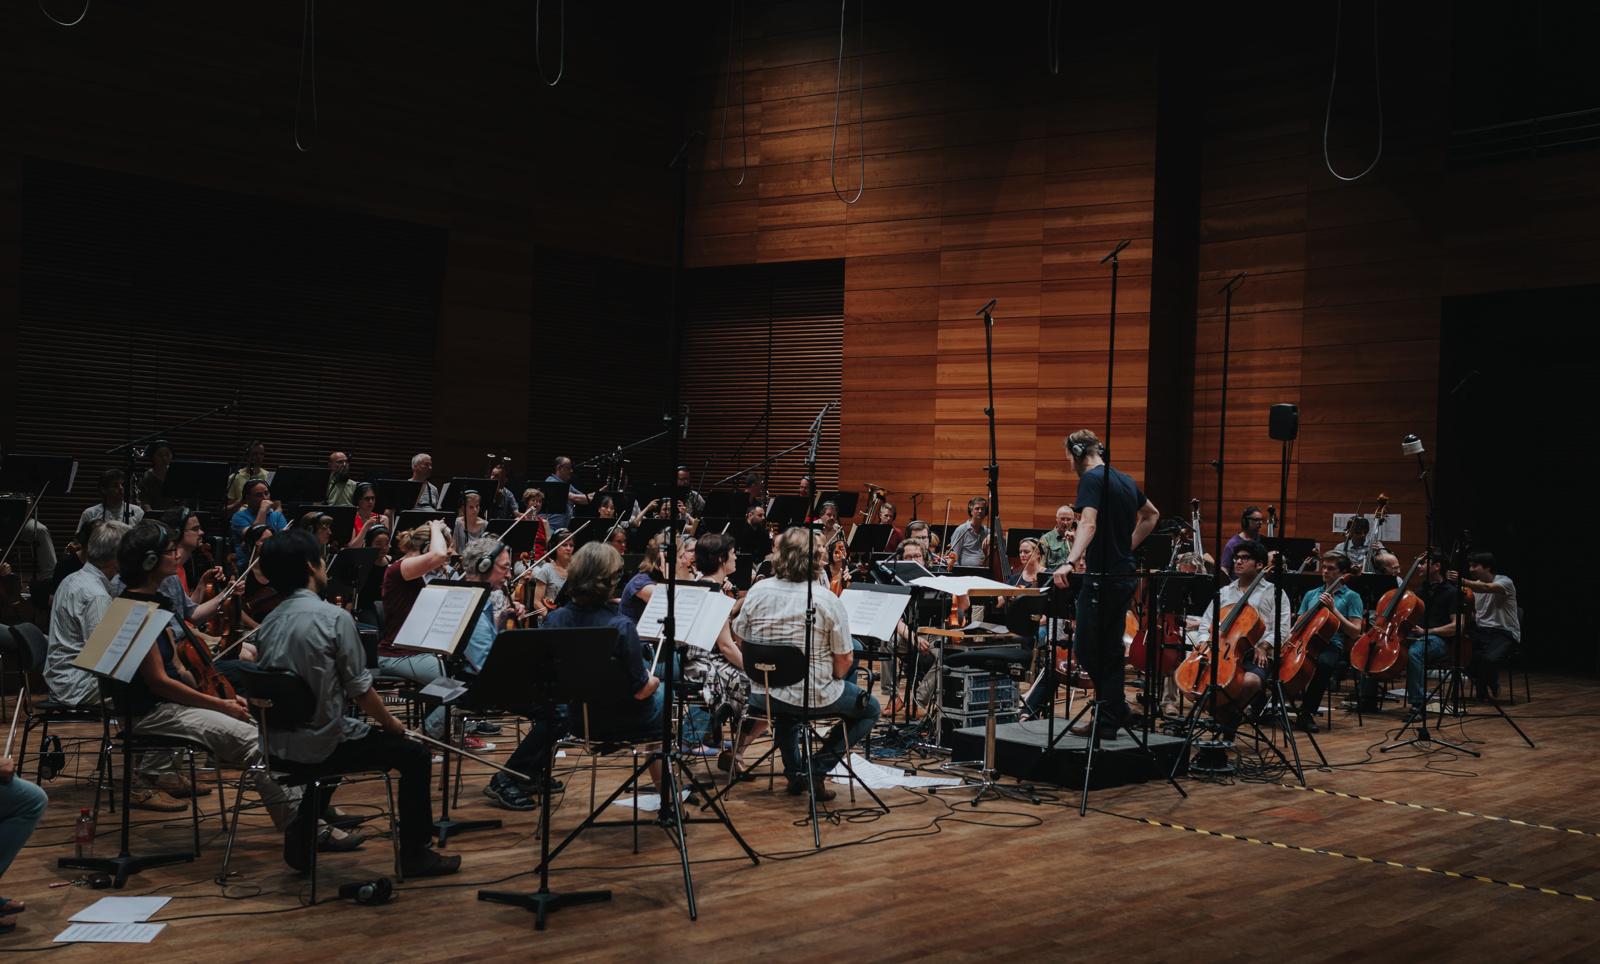 2bace2eefb8e68ed-Orchesteraufnahme_Weimar_IMG_6063-1.jpg